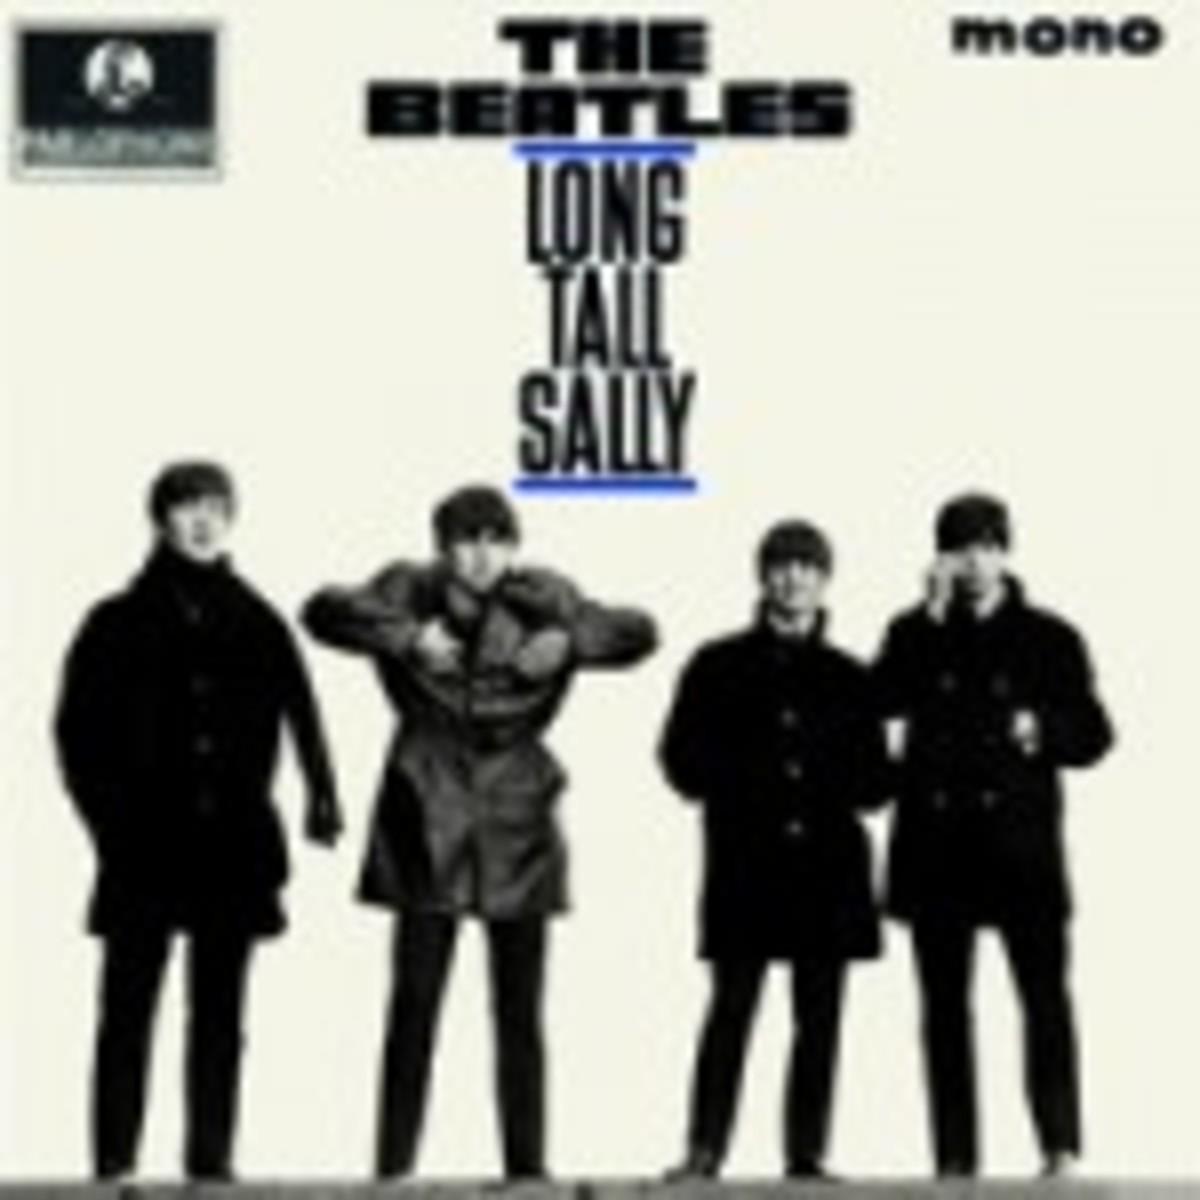 The Beatles Long Tall Sally mono vinyl